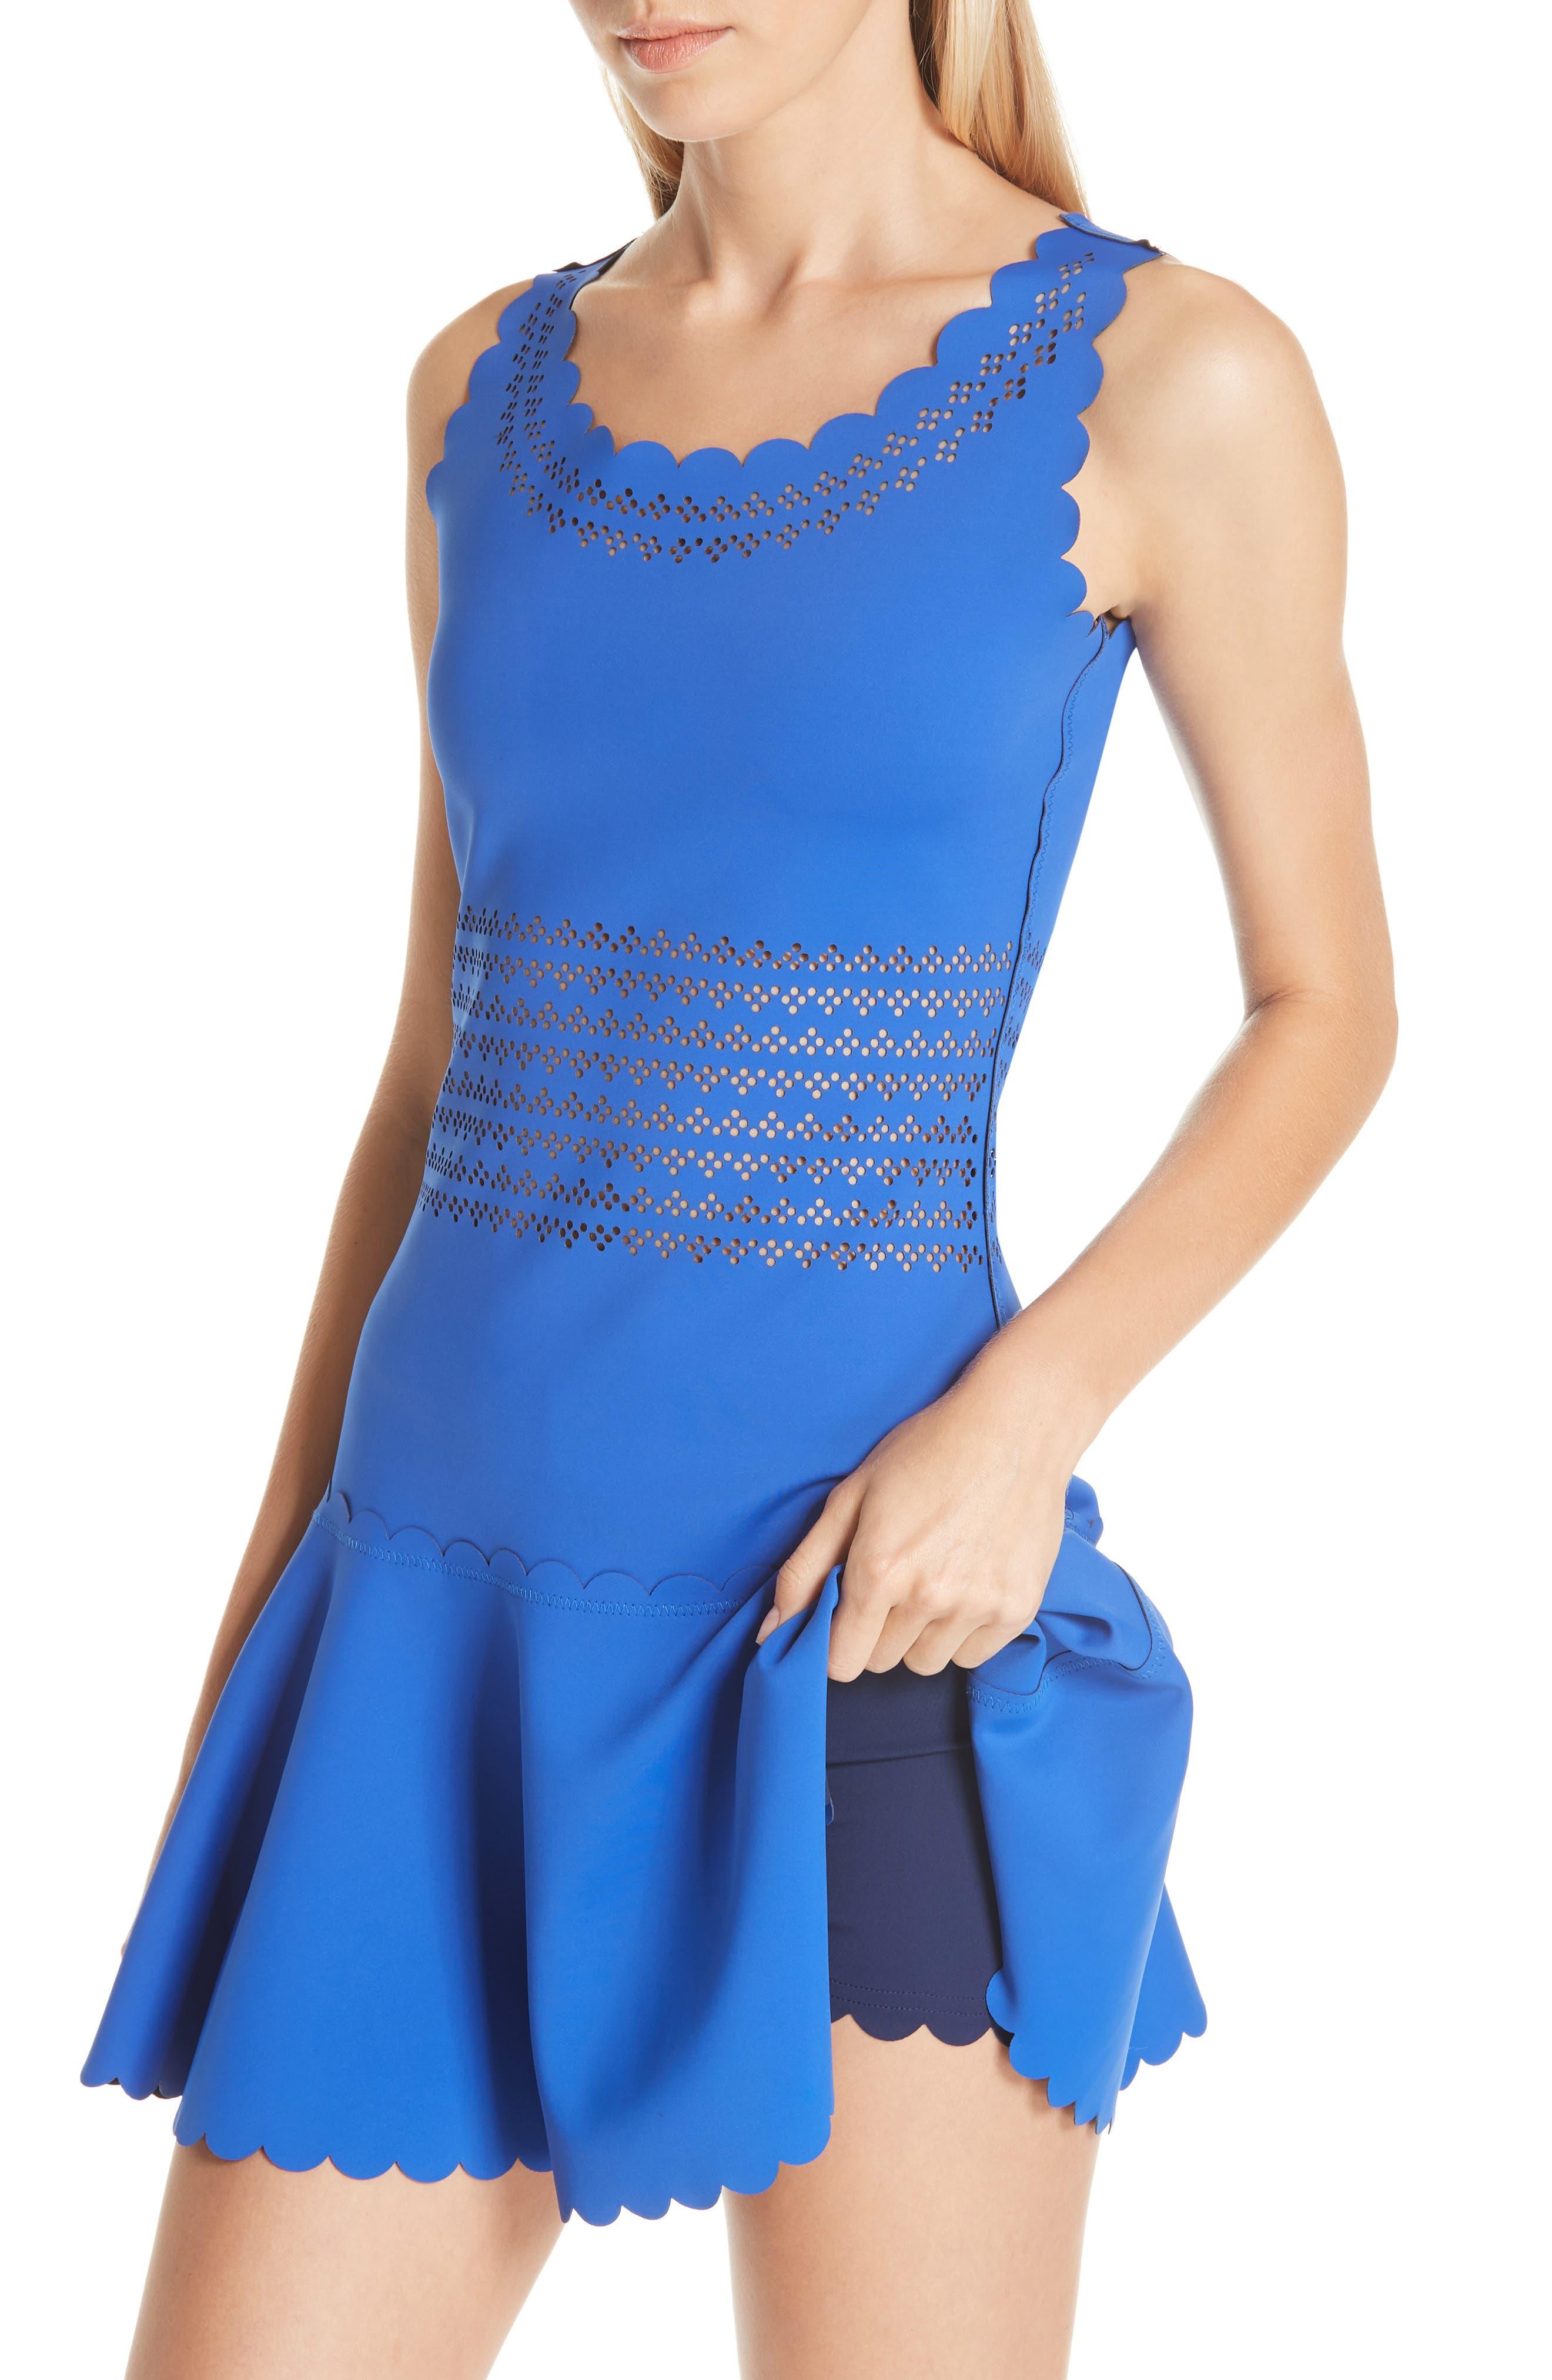 Center Court Tennis Dress,                             Alternate thumbnail 6, color,                             BLUE